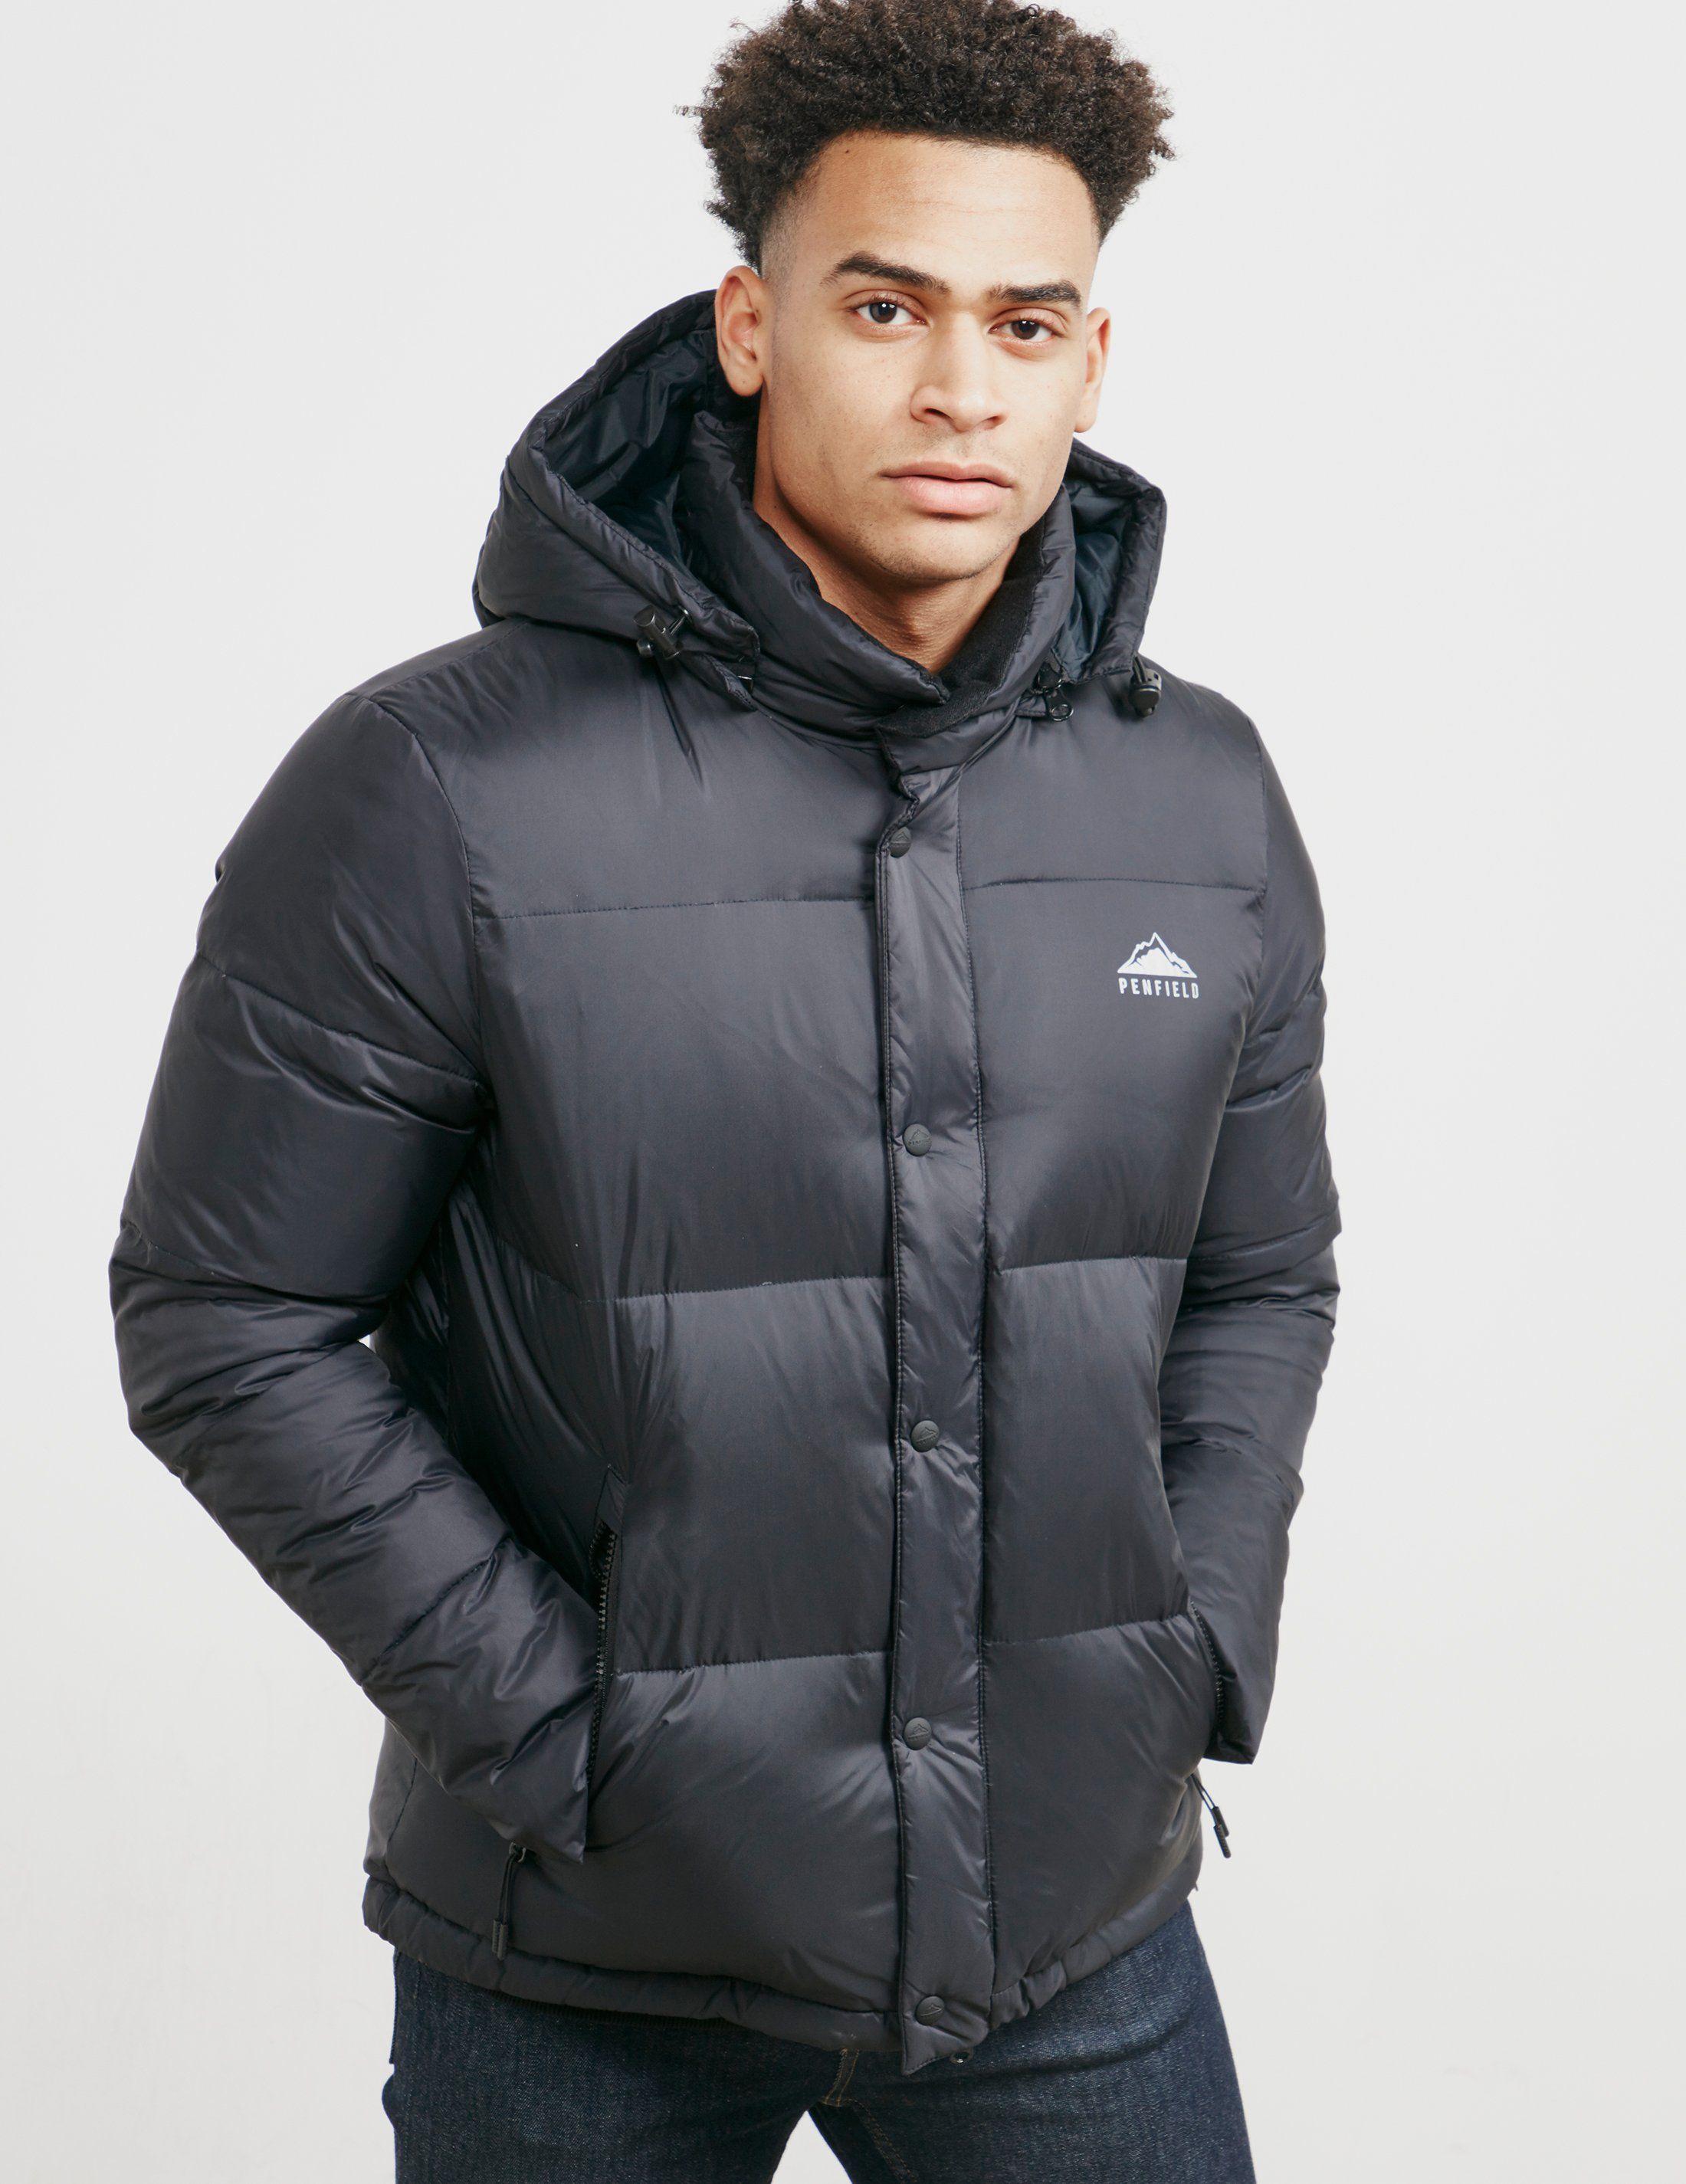 Penfield Equinox Padded Jacket